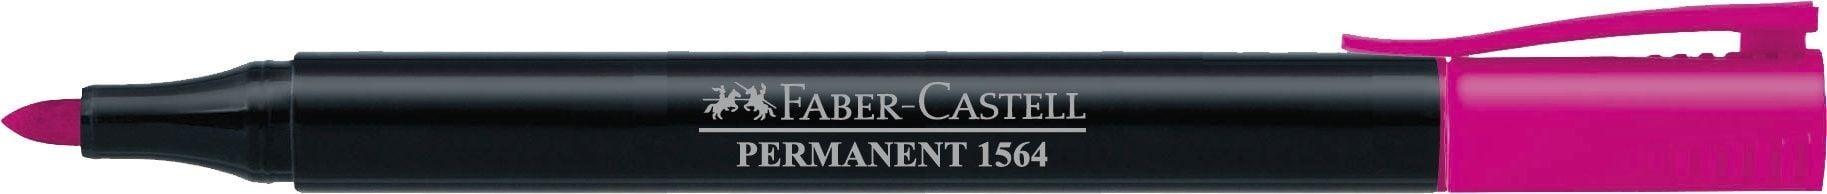 MARKER PERMANENT ROZ SLIM 1564 FABER-CASTELL